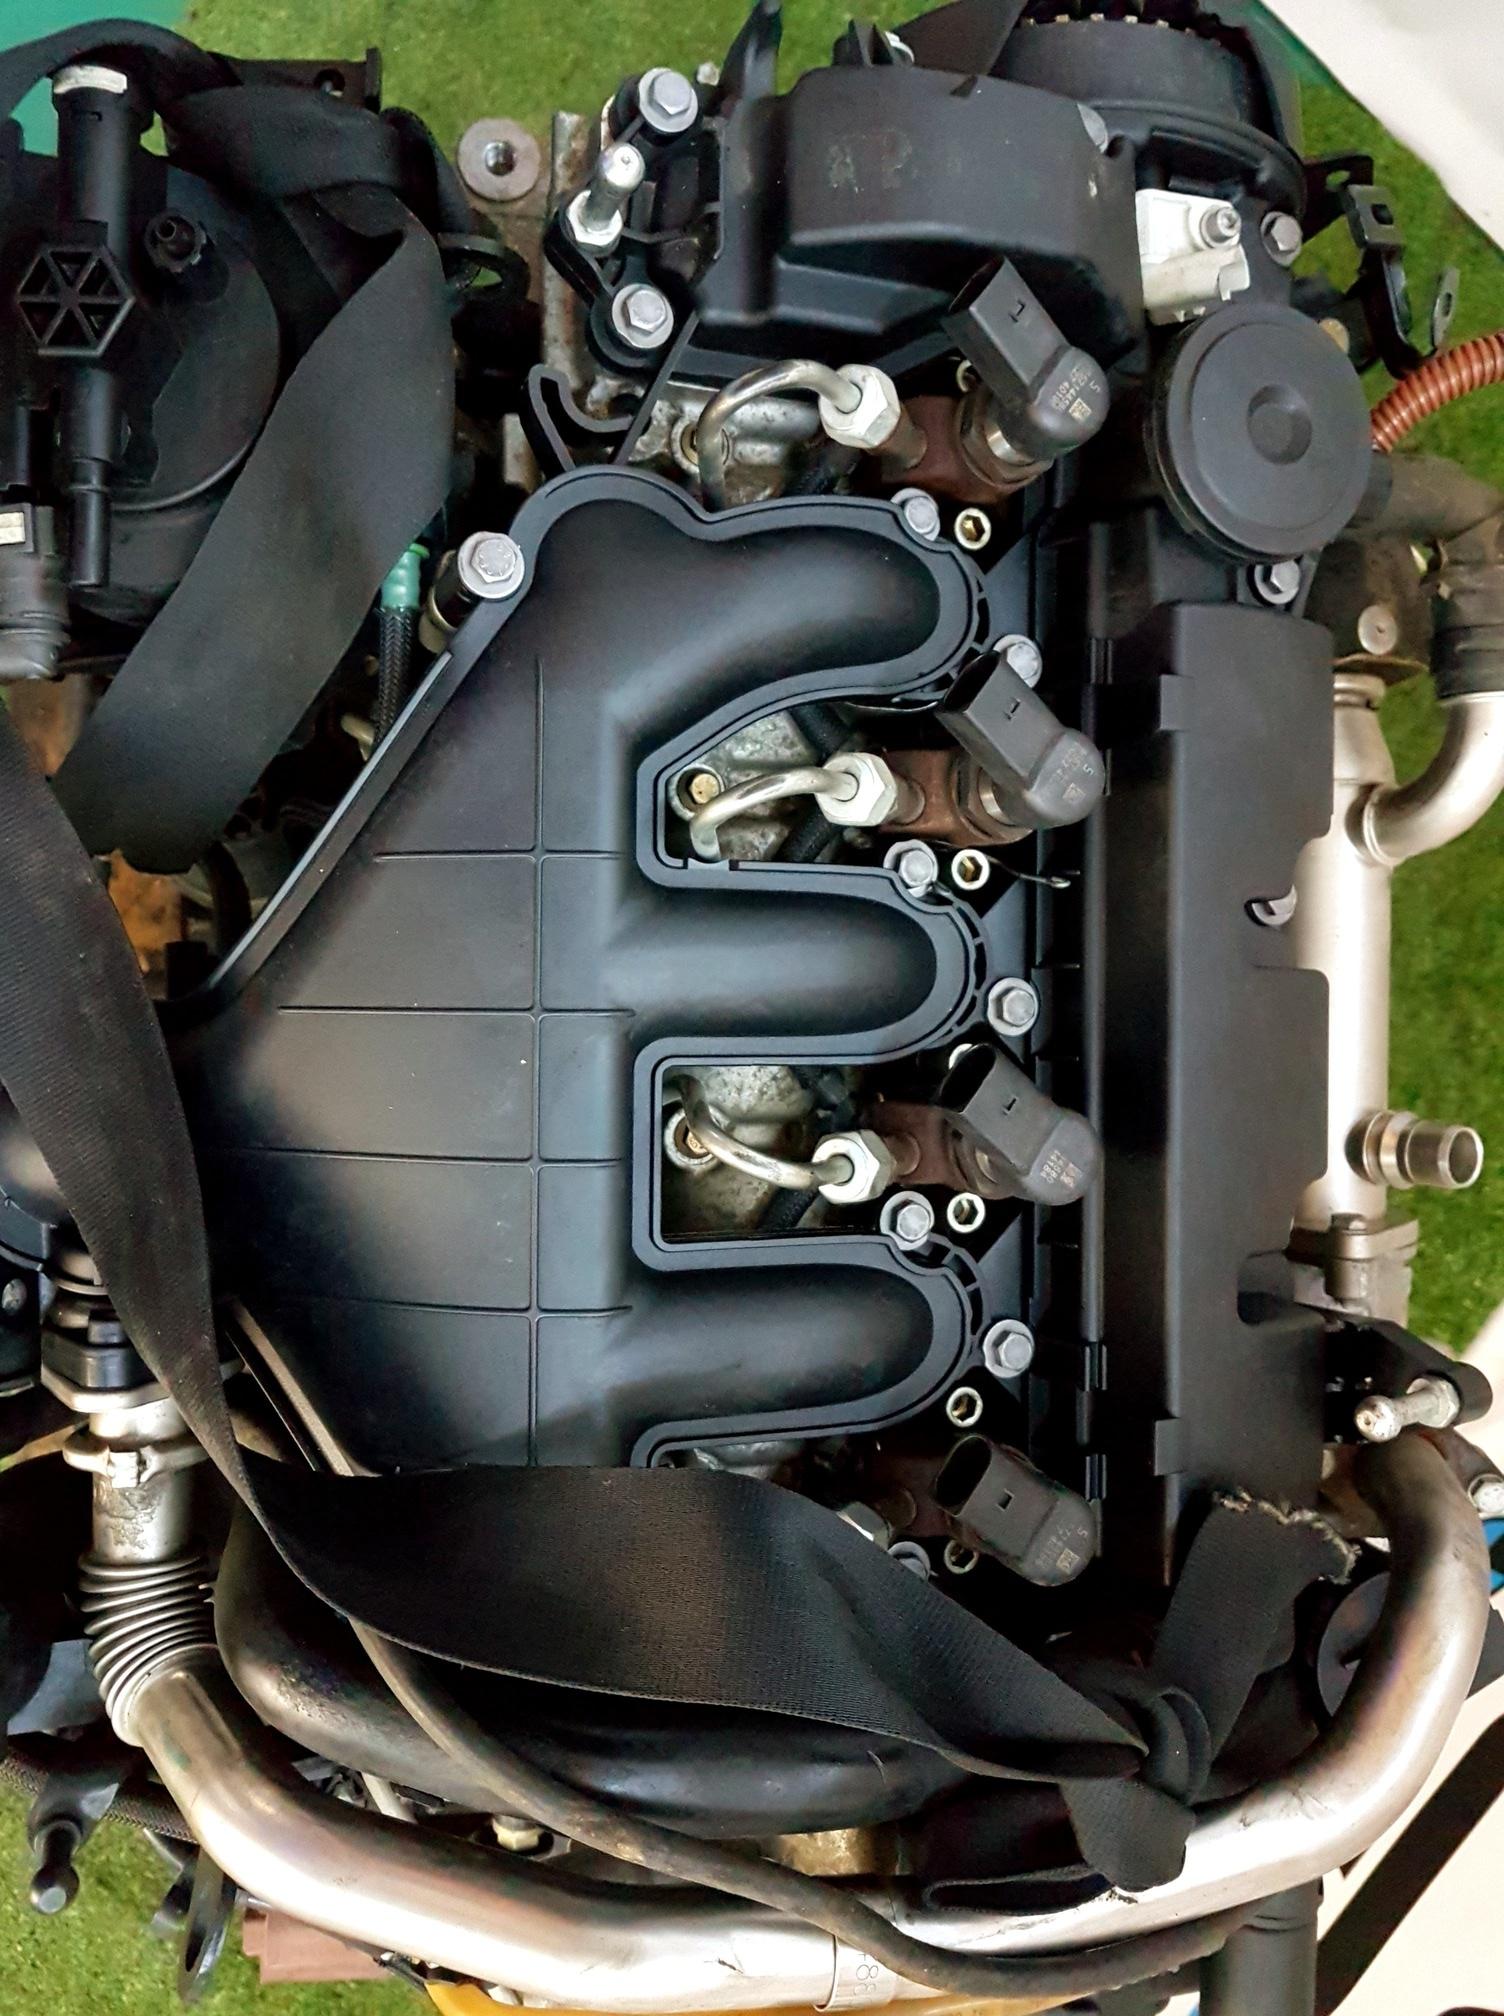 MOTOR Ford Focus II 2. 0 TDCI, año 2005. Ref. Motor G6DA